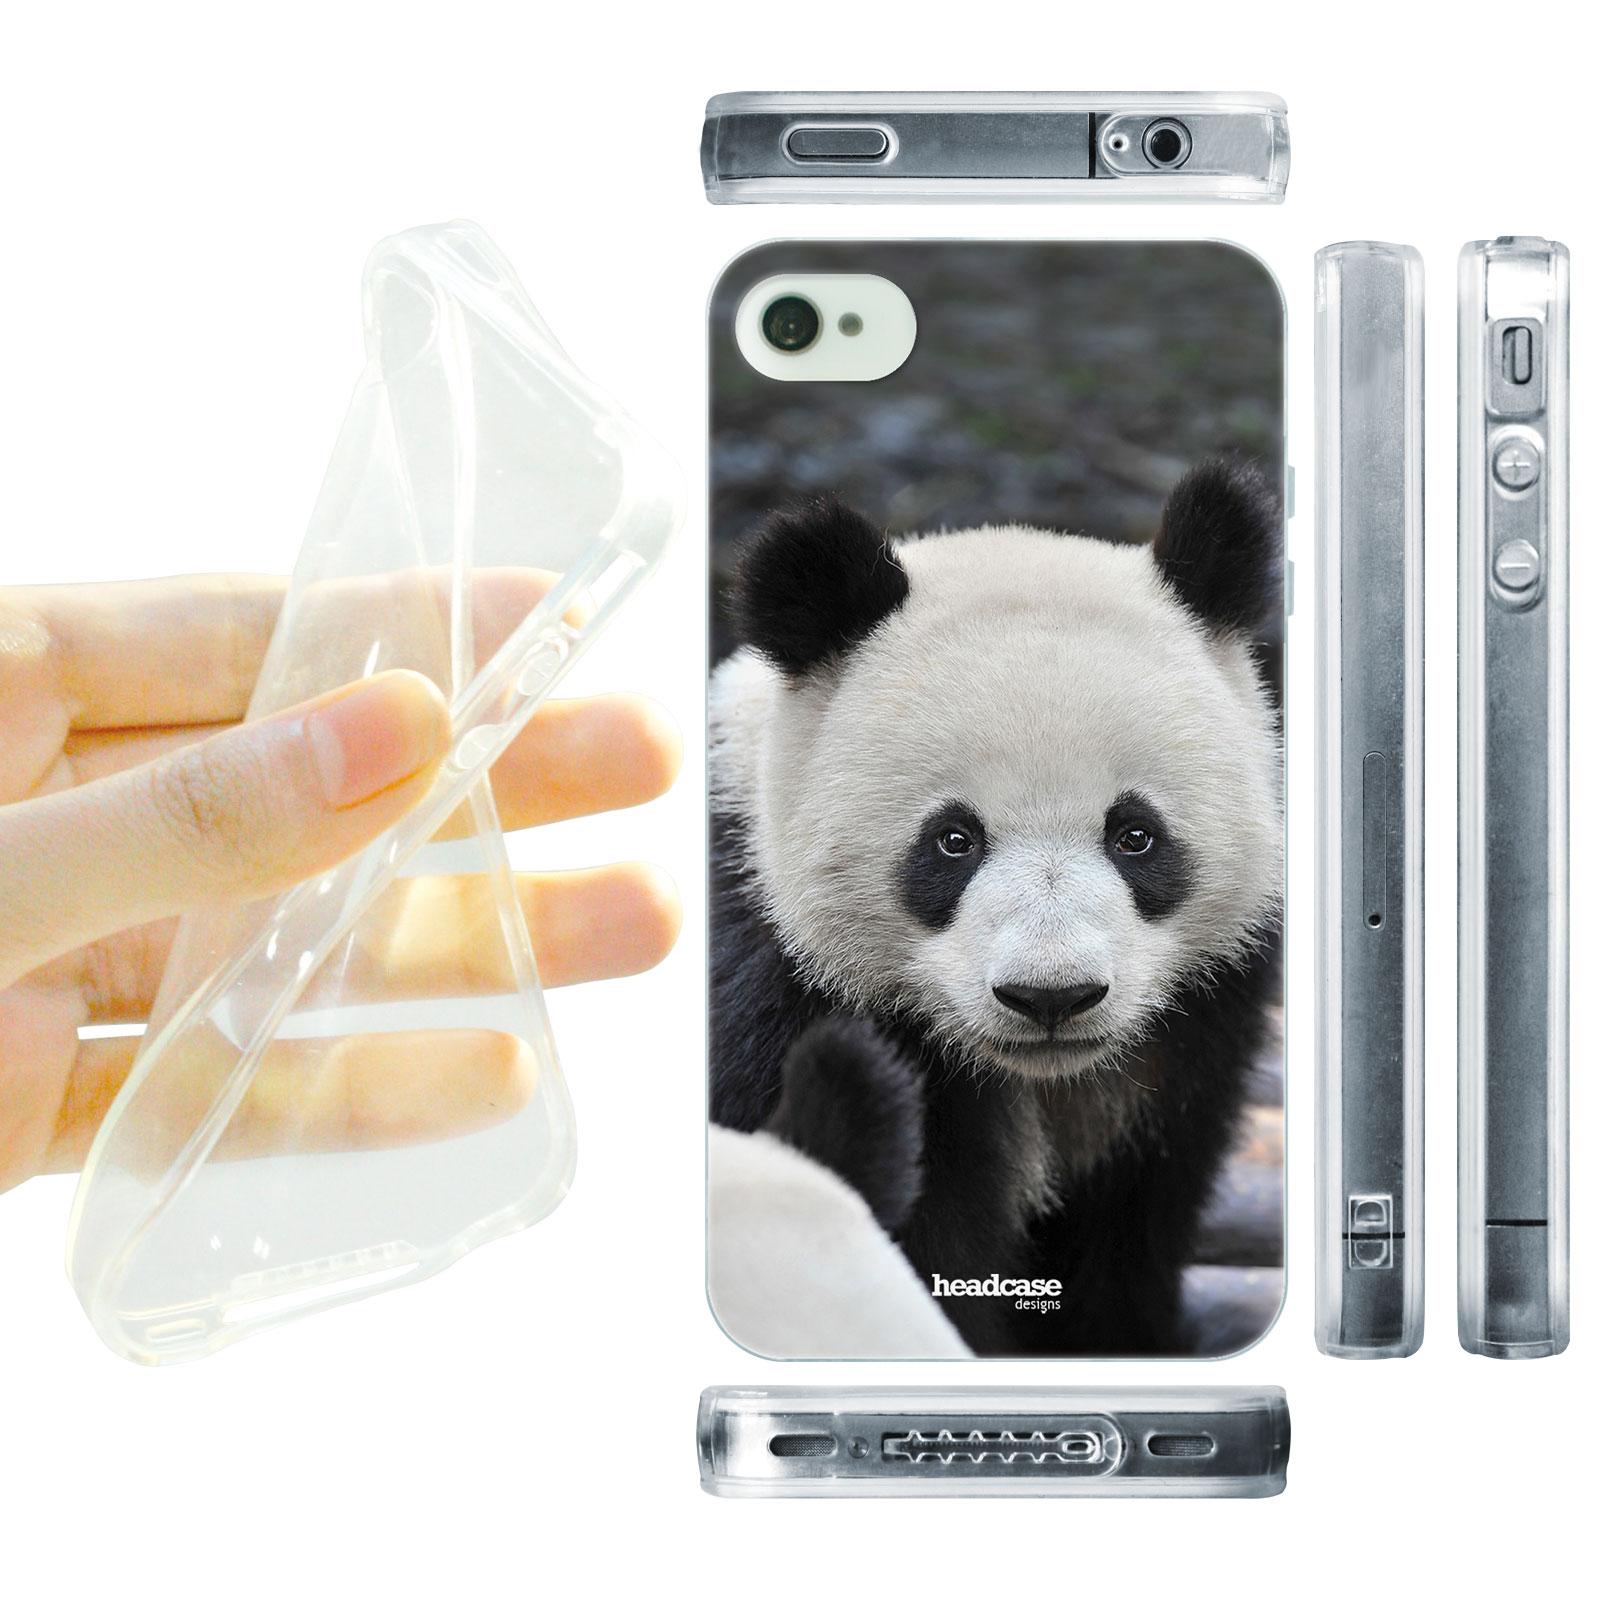 HEAD CASE silikonový obal na mobil Iphone 4/4S divočina černá a bílá barva medvídek panda